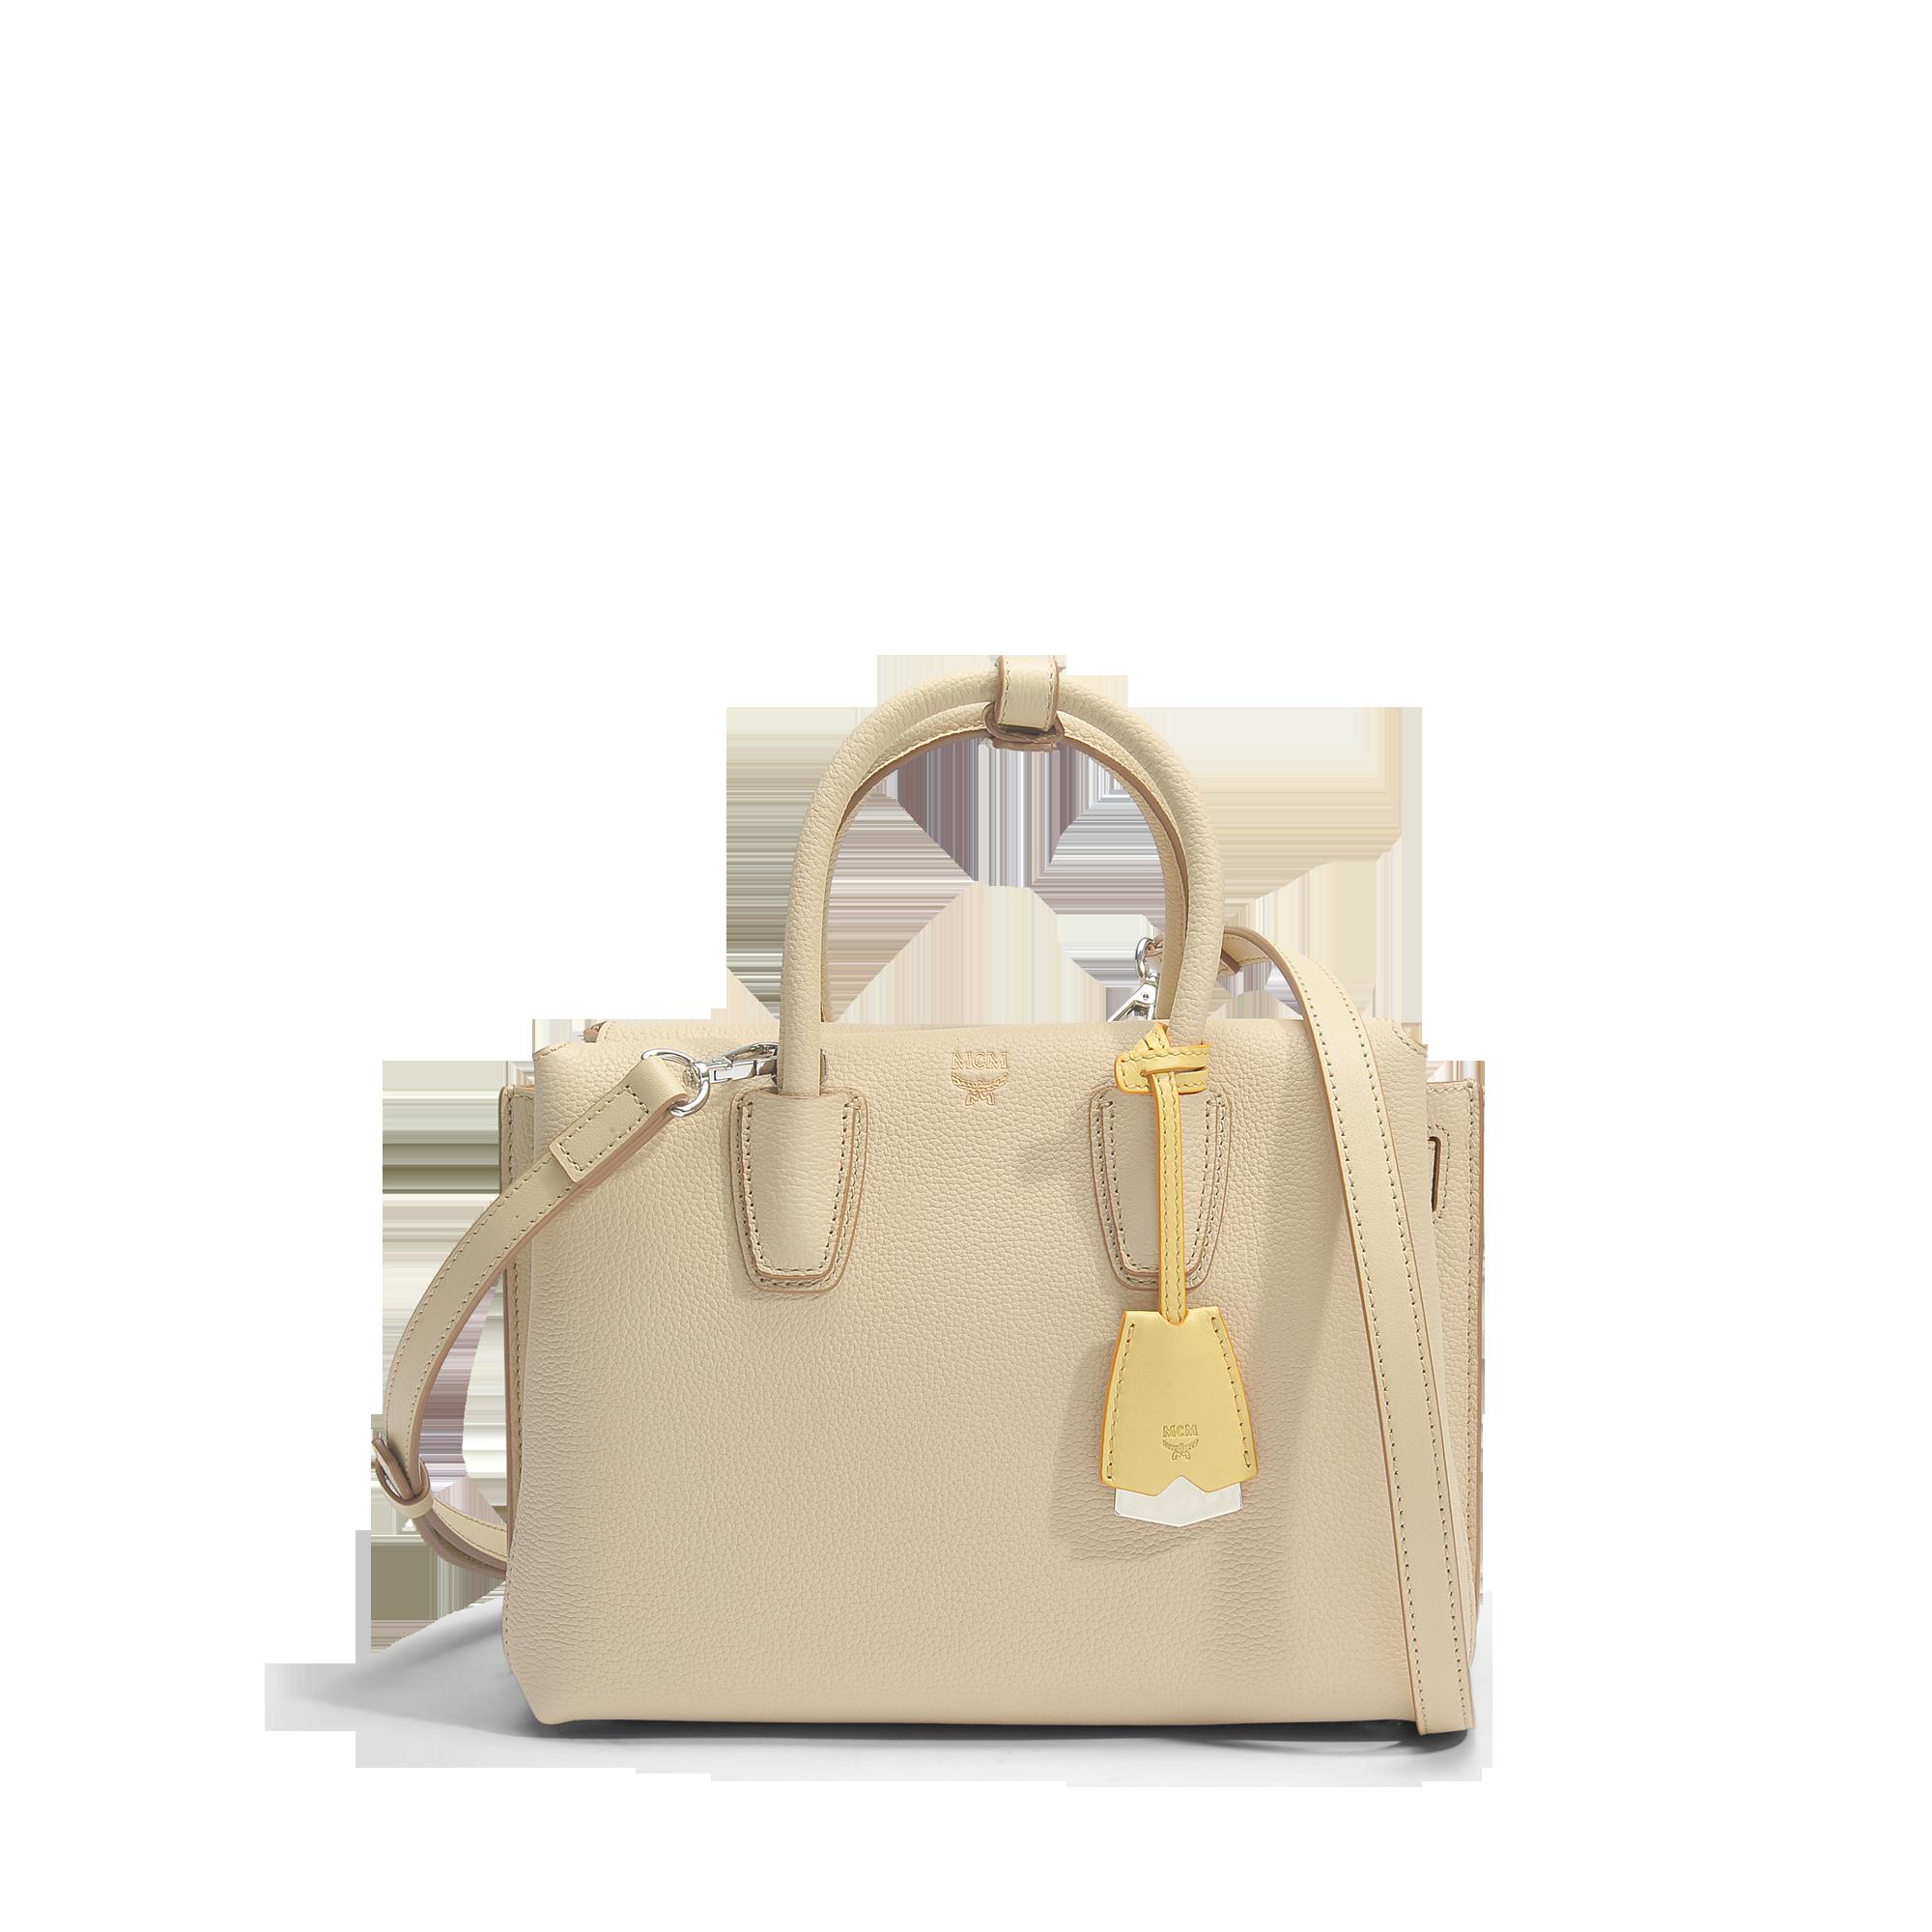 Classic Goedkope Online Mcm Milla Small Tote Bag in Latte Beige Park Avenue Leather Klaring Bezoek Nieuw RIWijbrvik